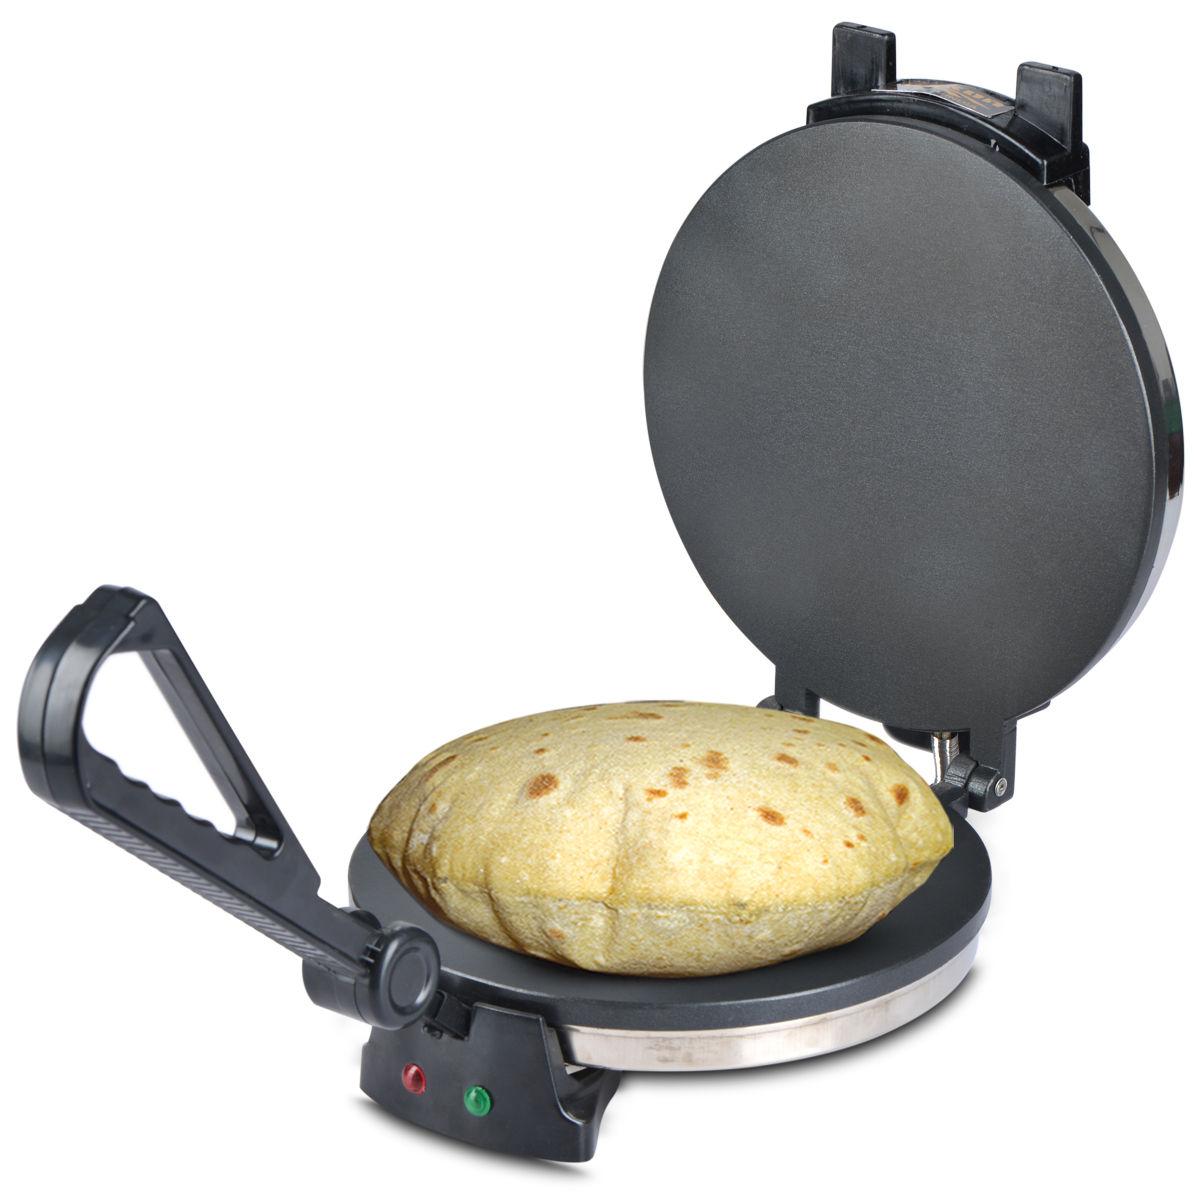 Free Kitchen Design App Buy Jumbo Roti Maker Online At Best Price In India On